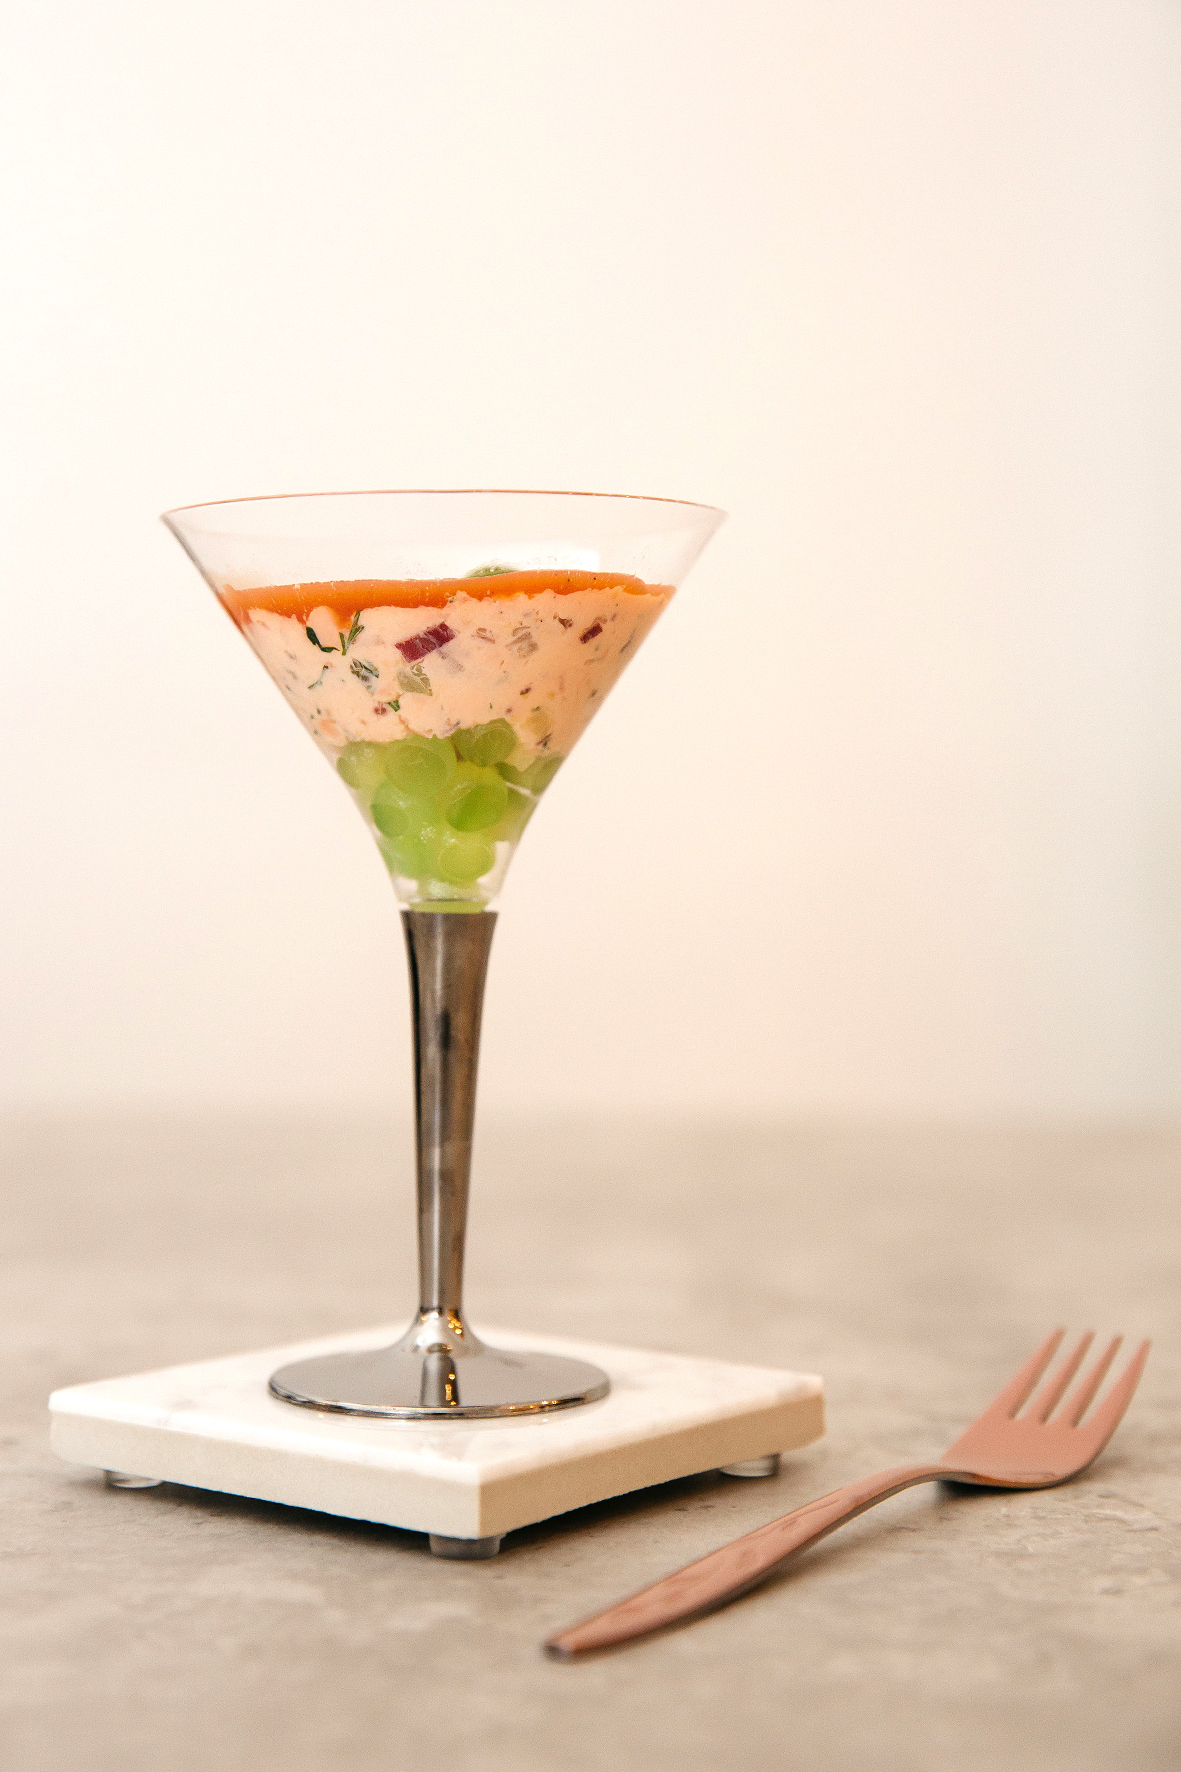 Fish starter in martini glass